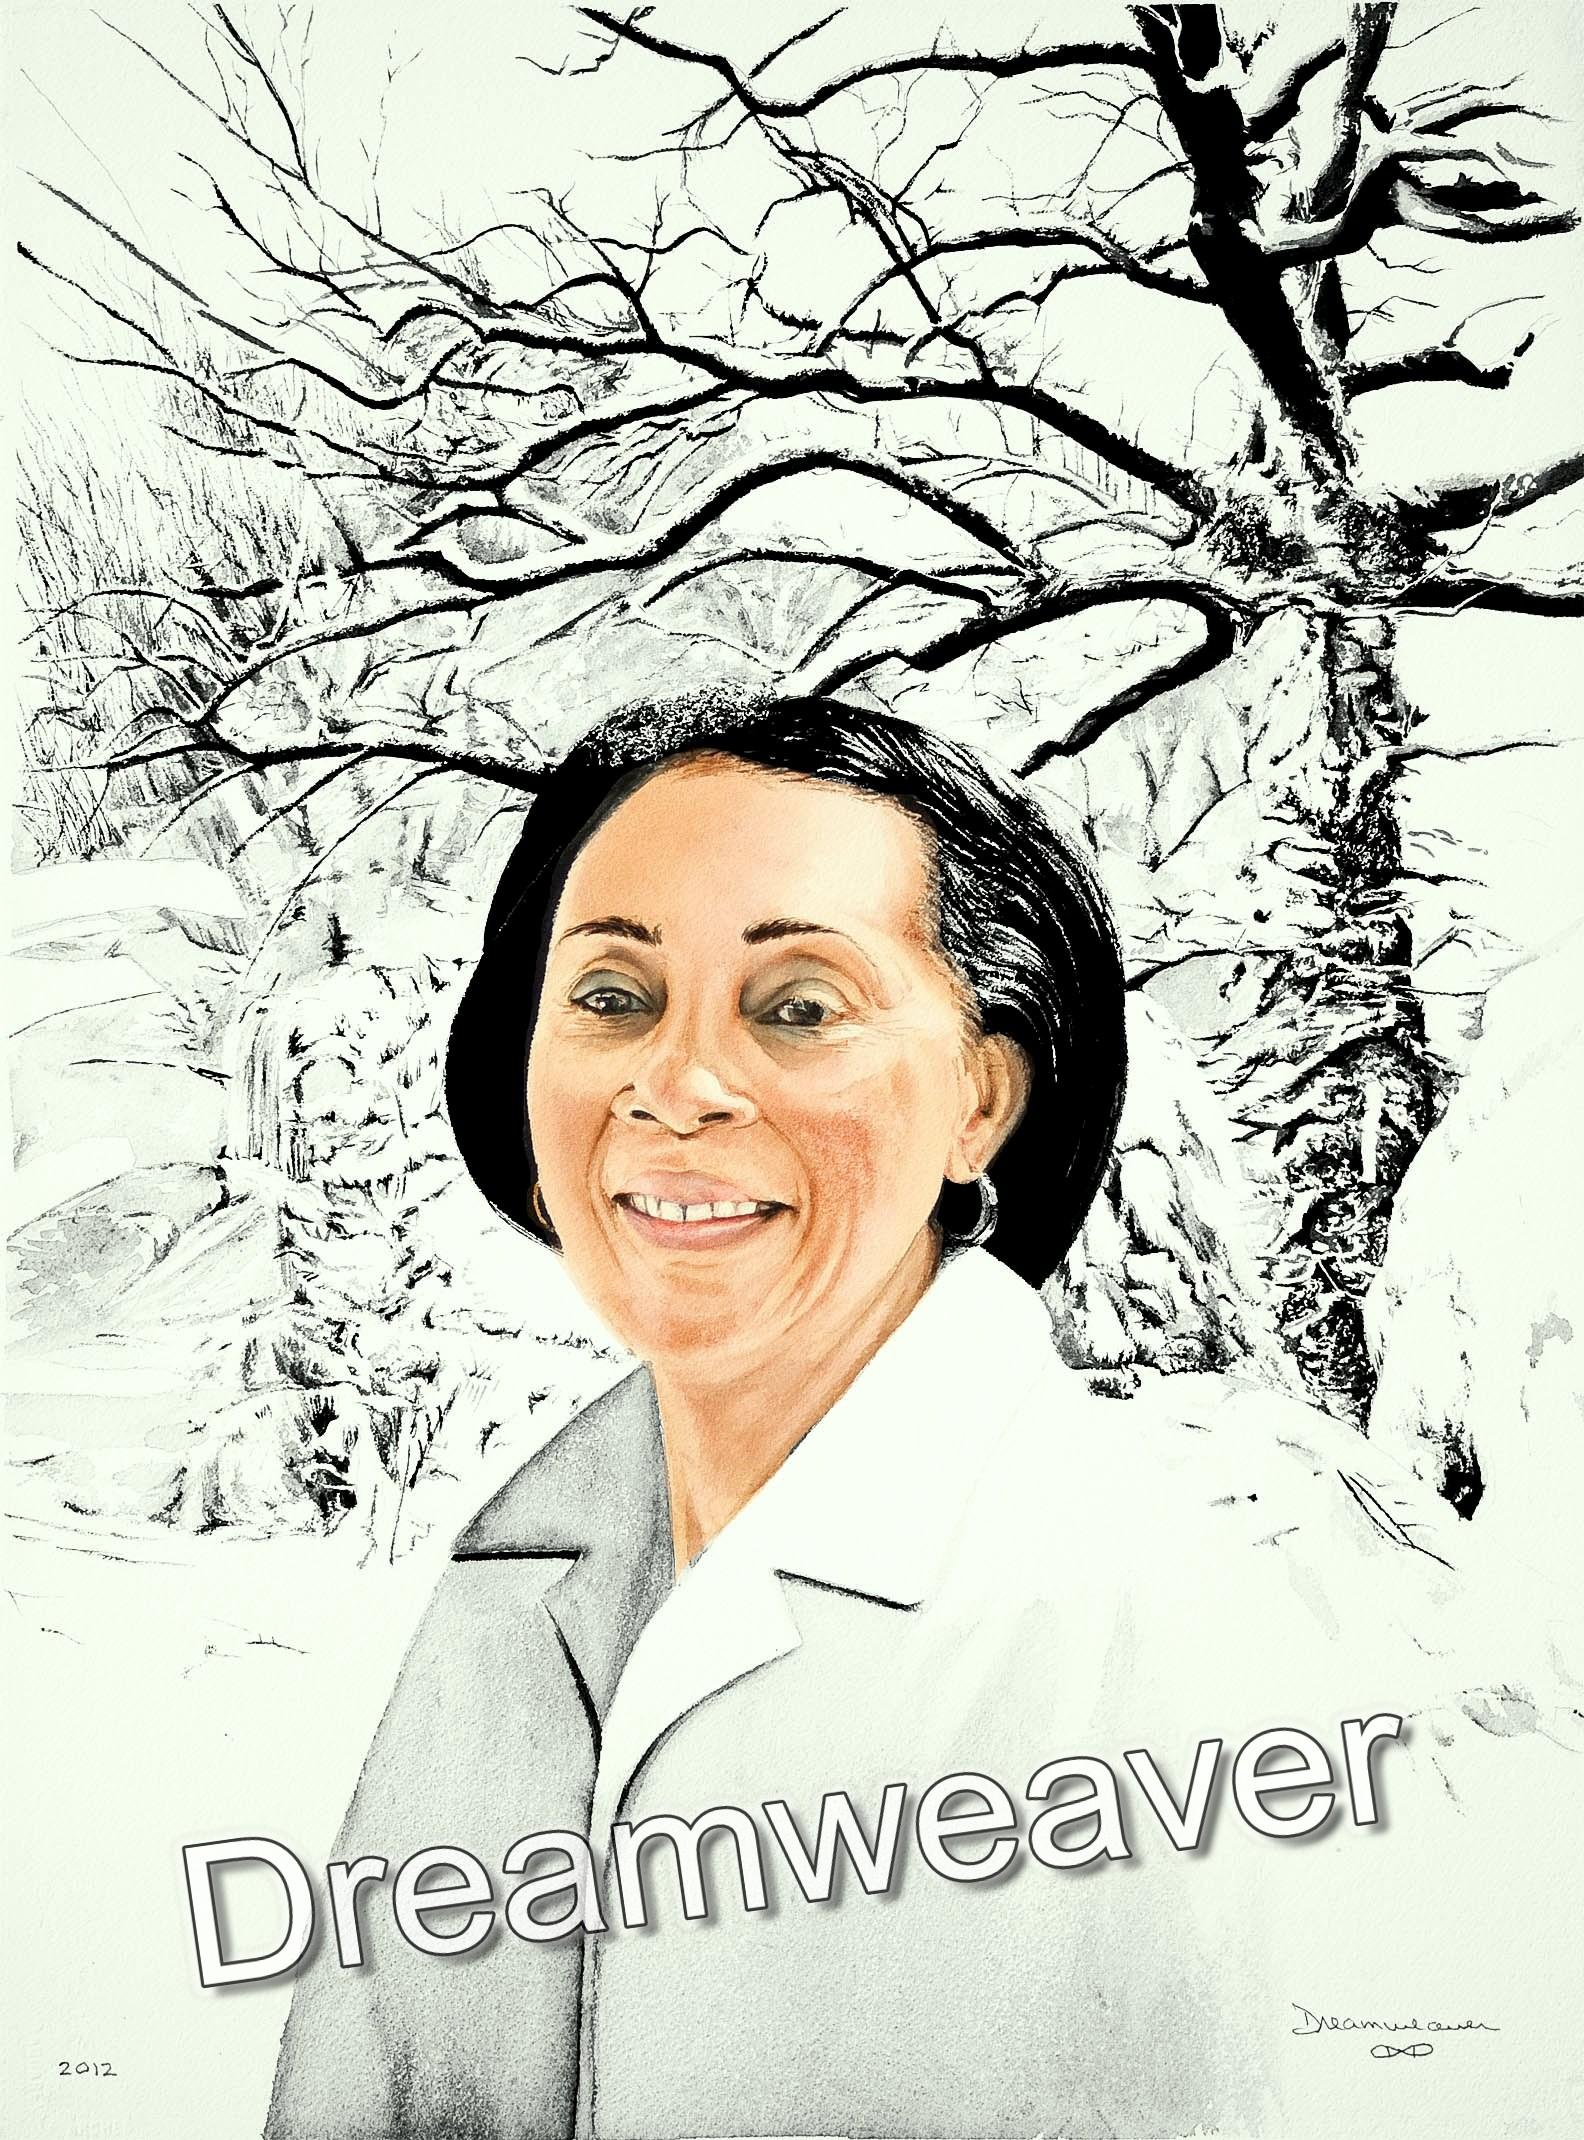 White by Dreamweaver